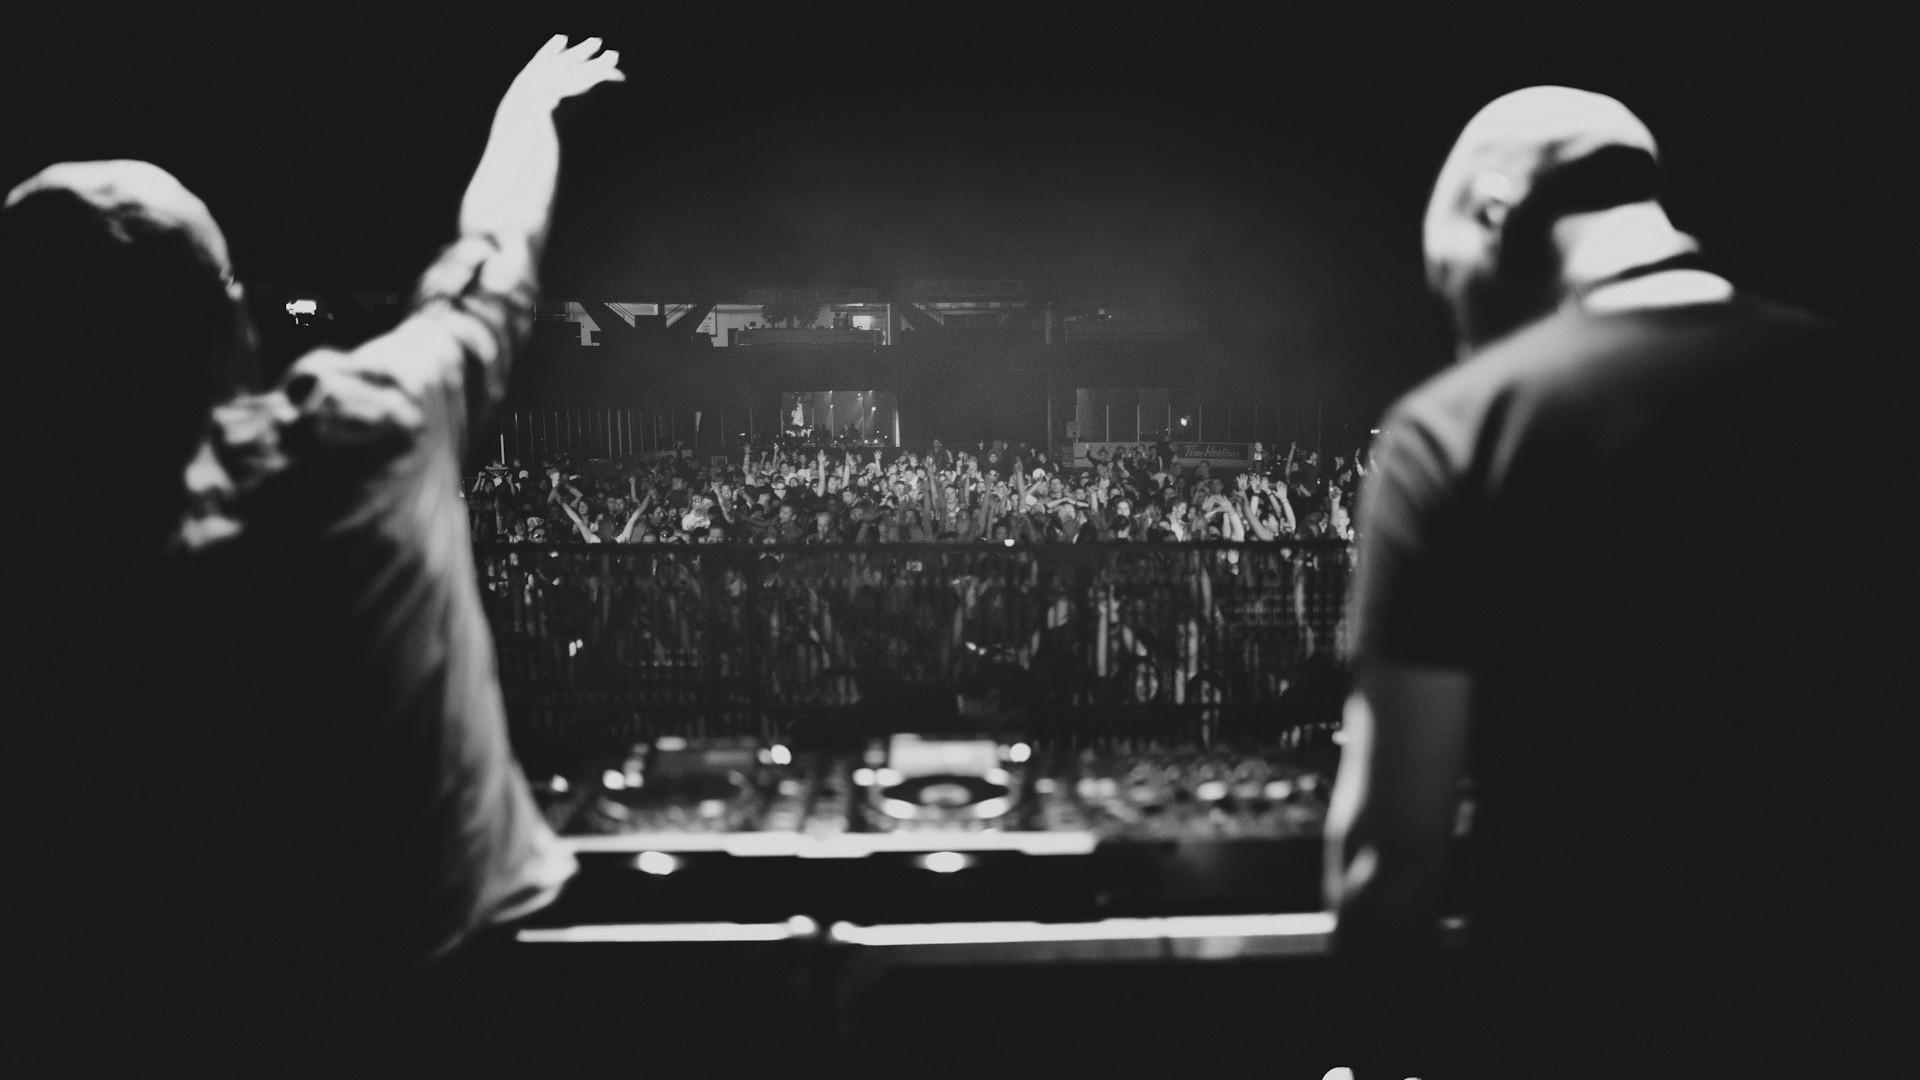 Music – DJ Wallpaper